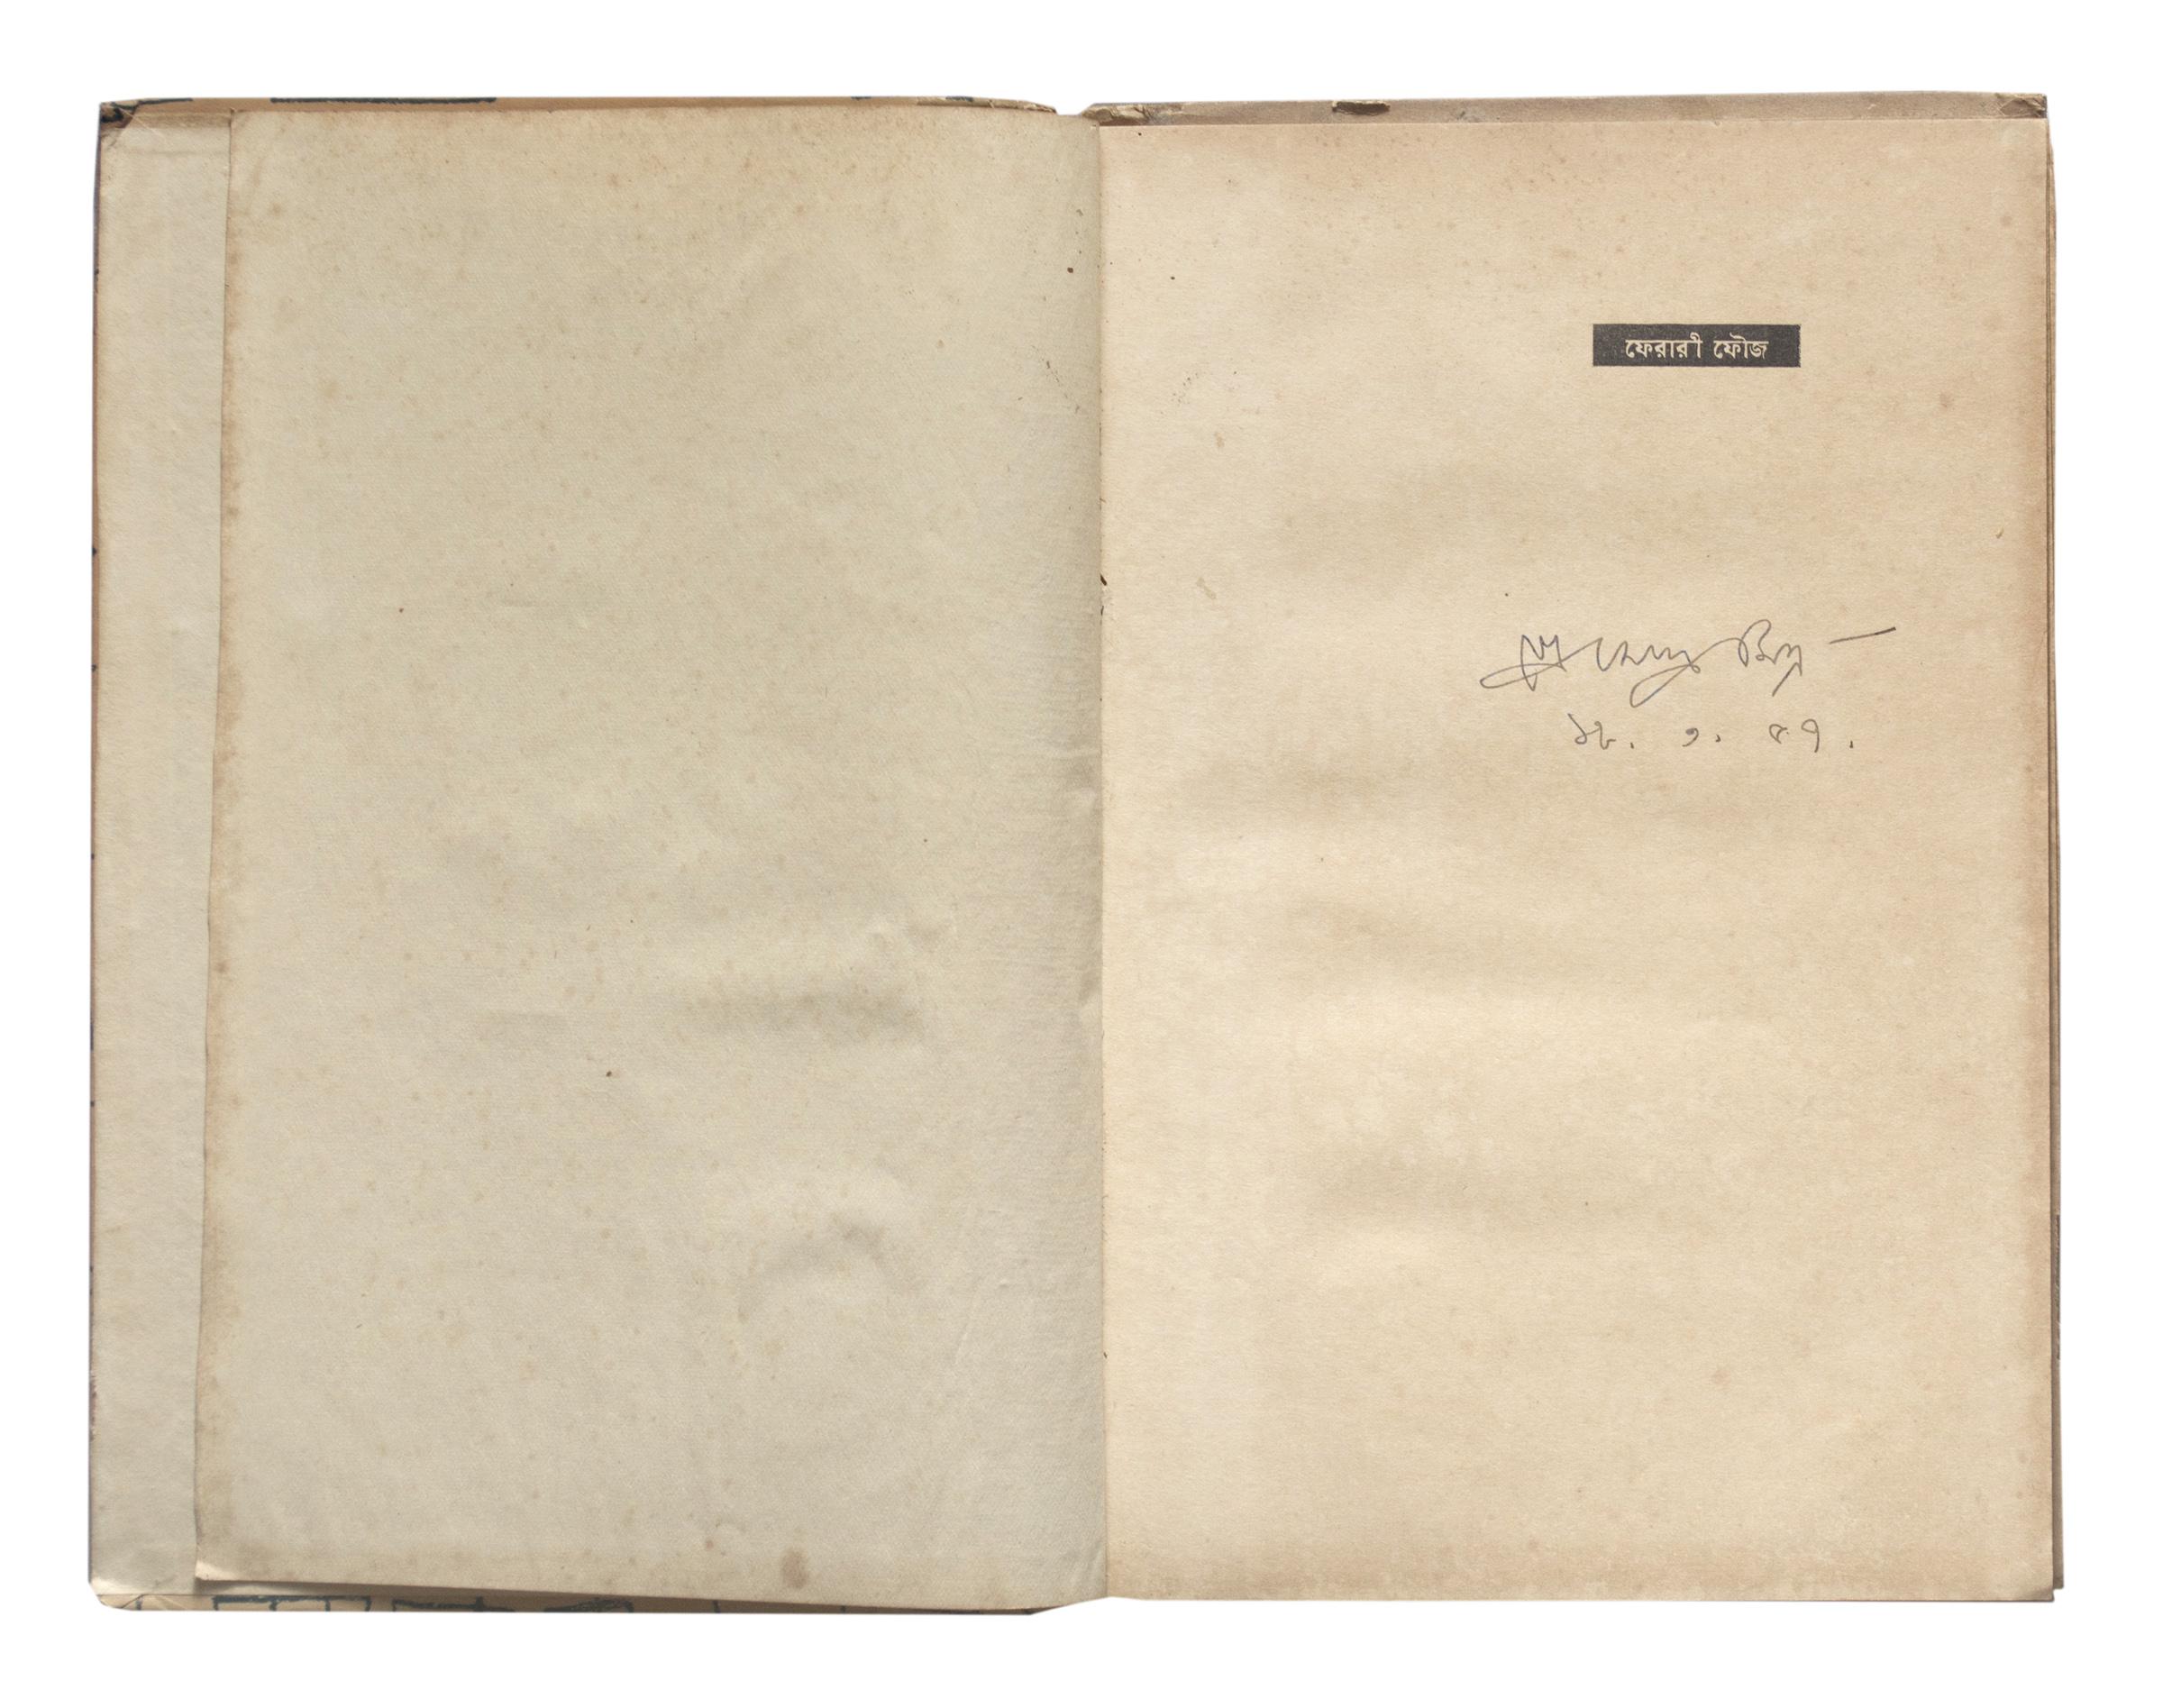 Ferari Fauj (collection of poems in Bengali) by Premendra Mitra